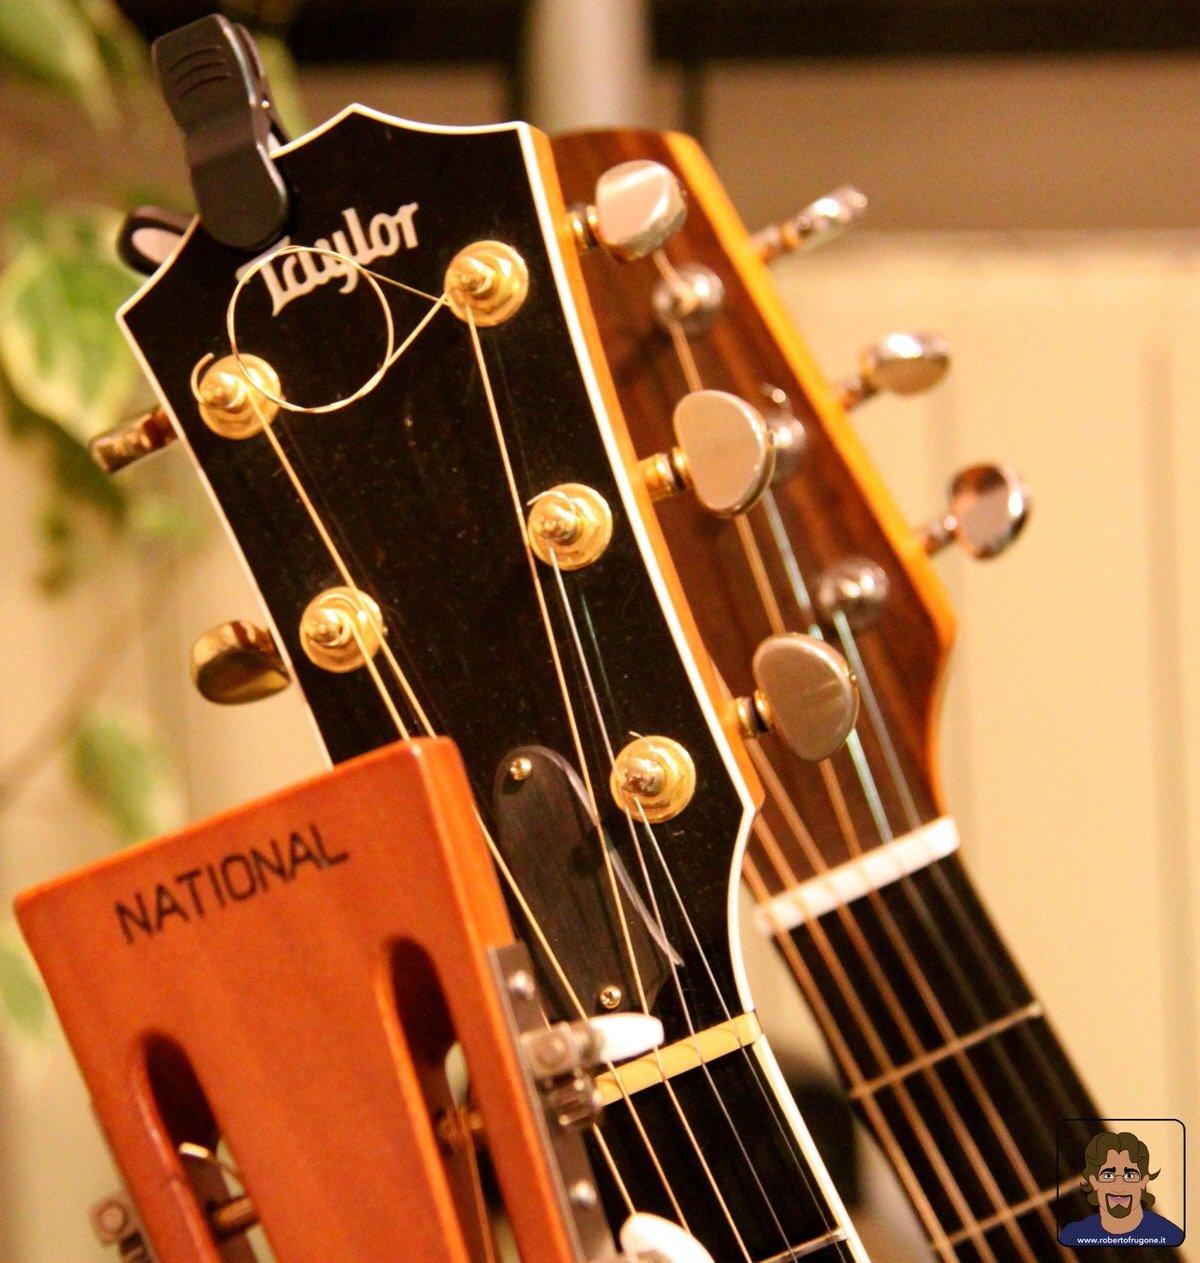 Totem Studio Sala Prove Musicali Casarza Ligure palette chitarre